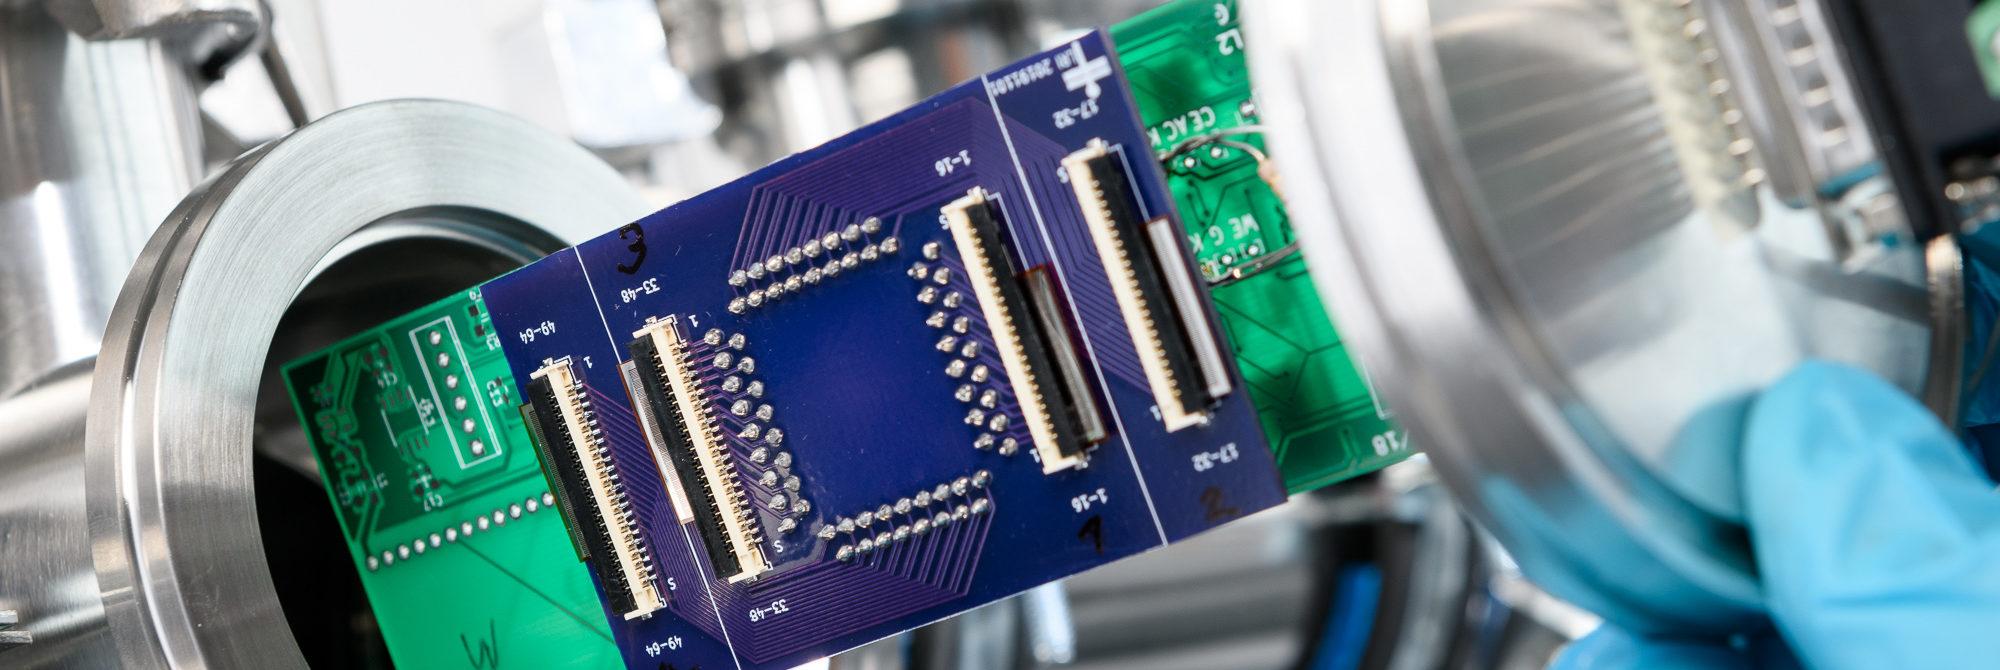 SmartNanotubes Technologies GmbH